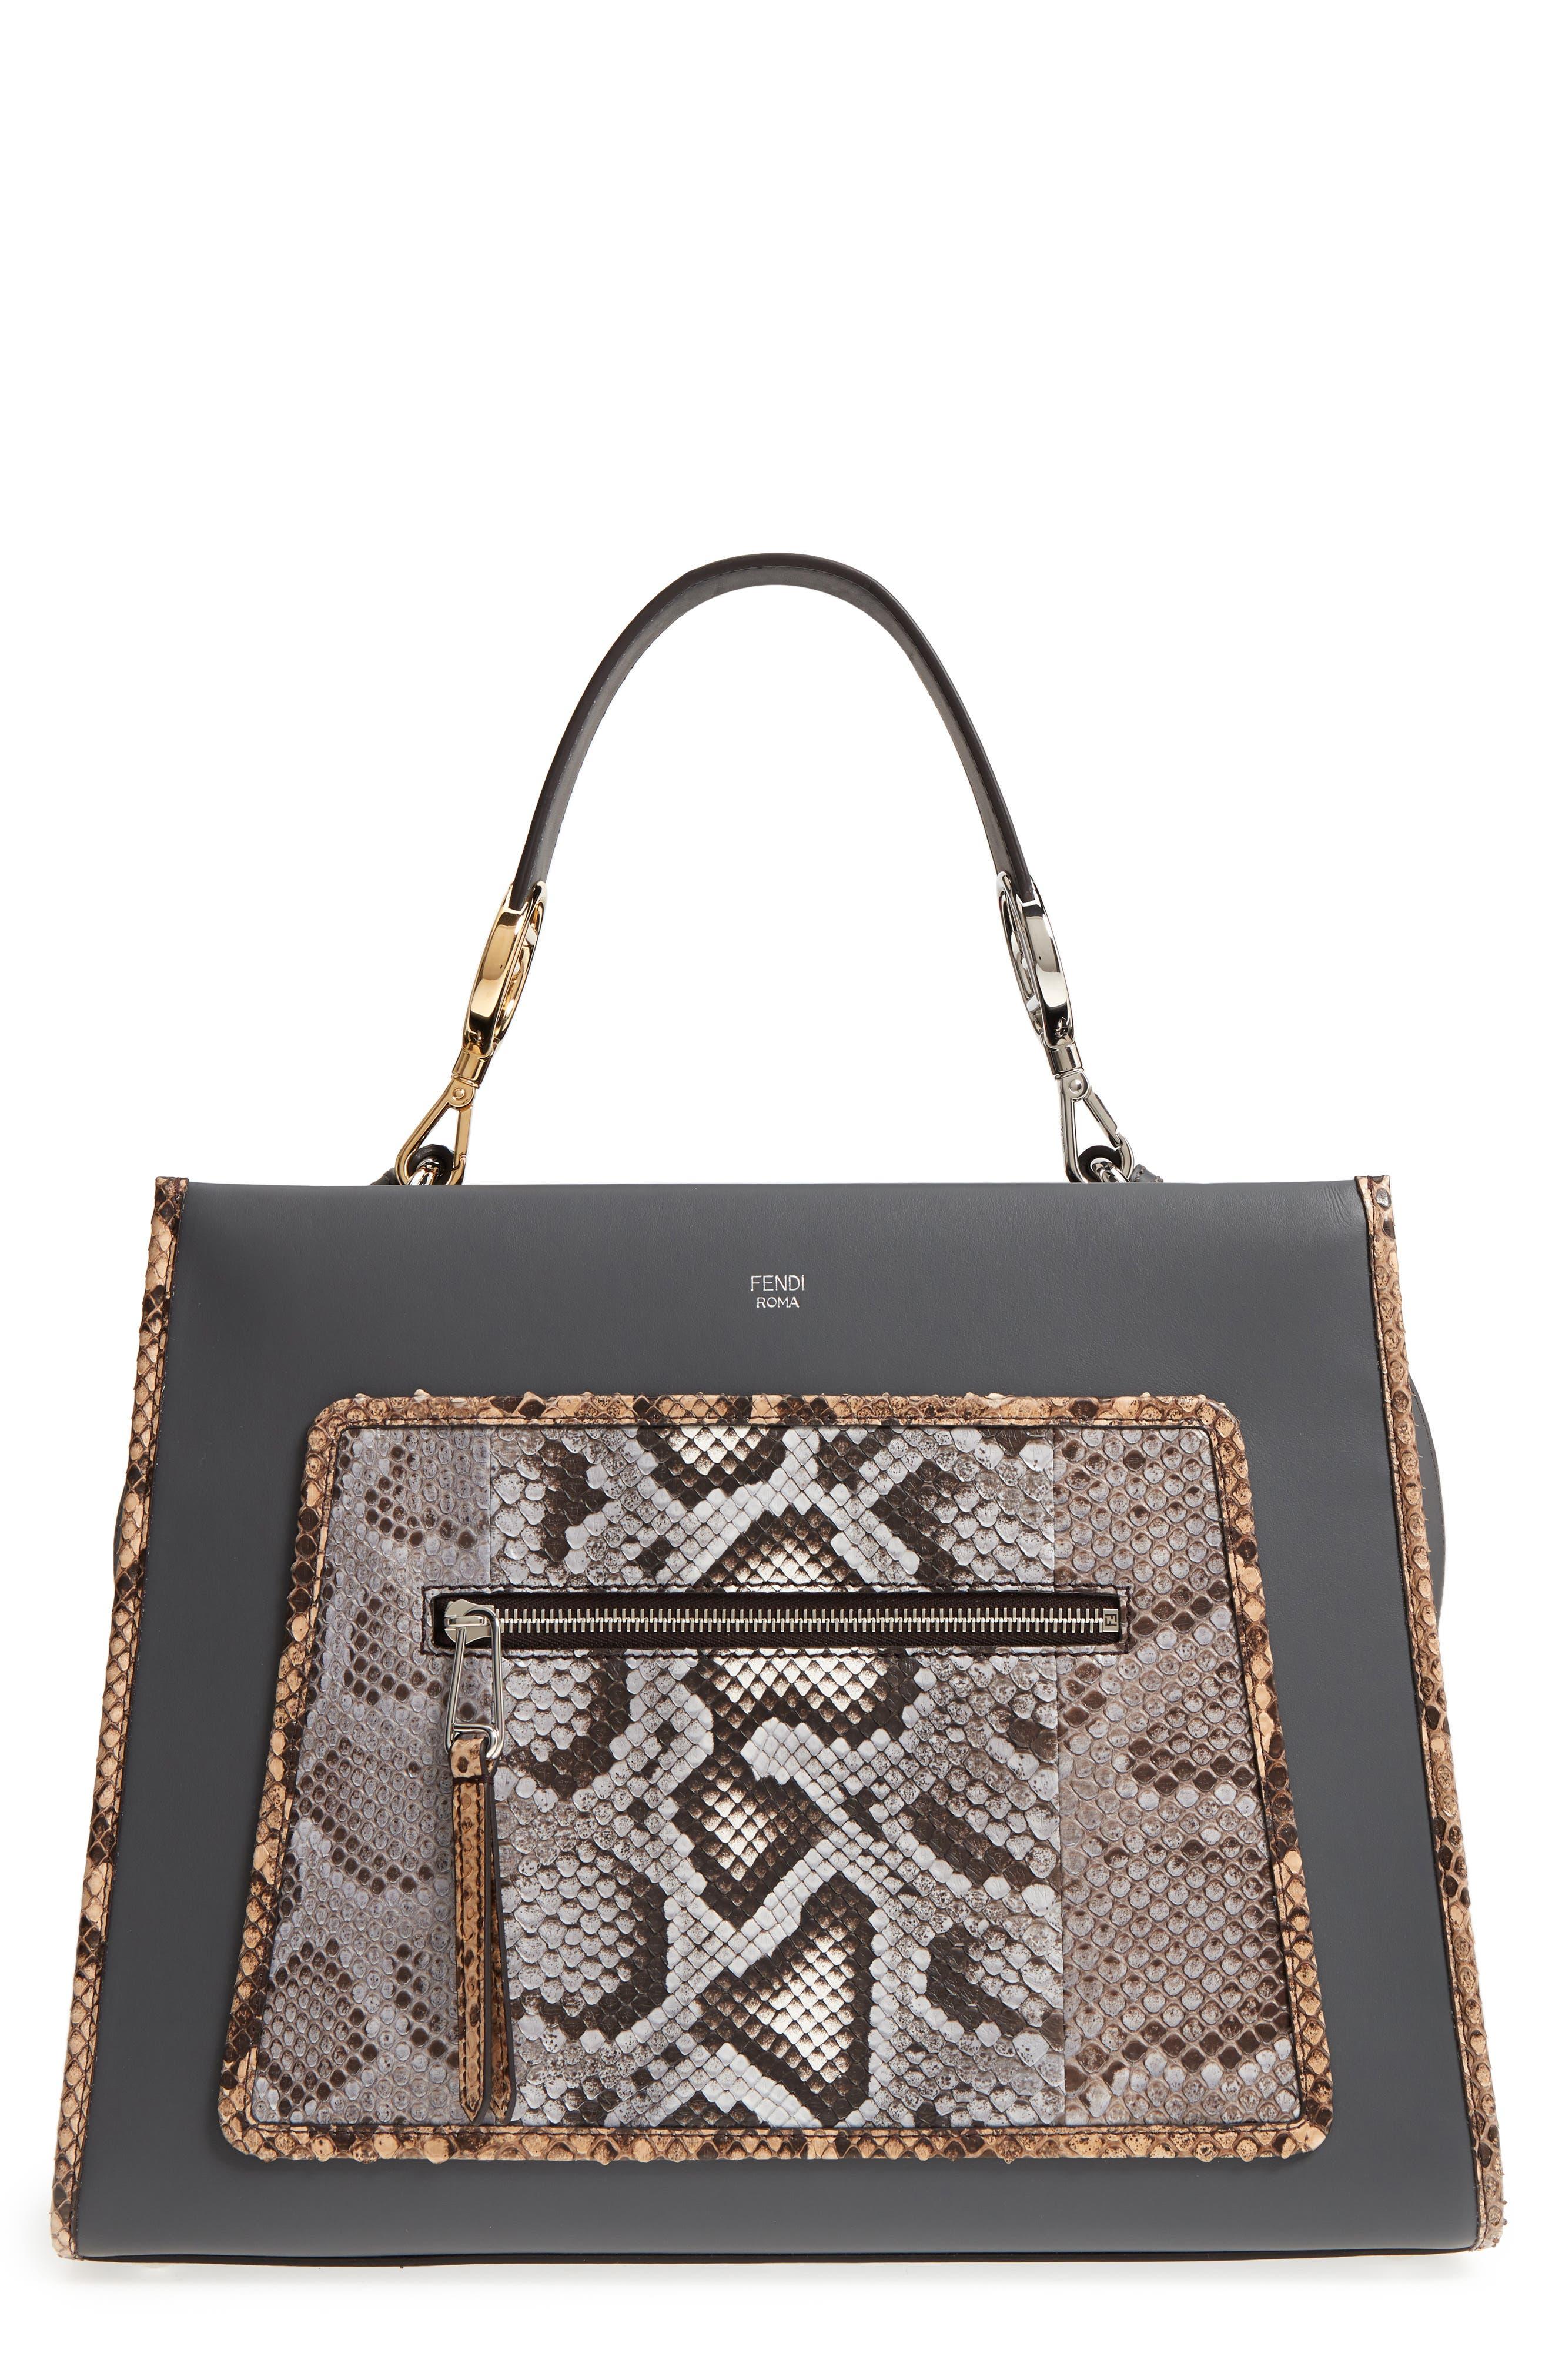 Fendi Runaway Leather & Genuine Python Tote